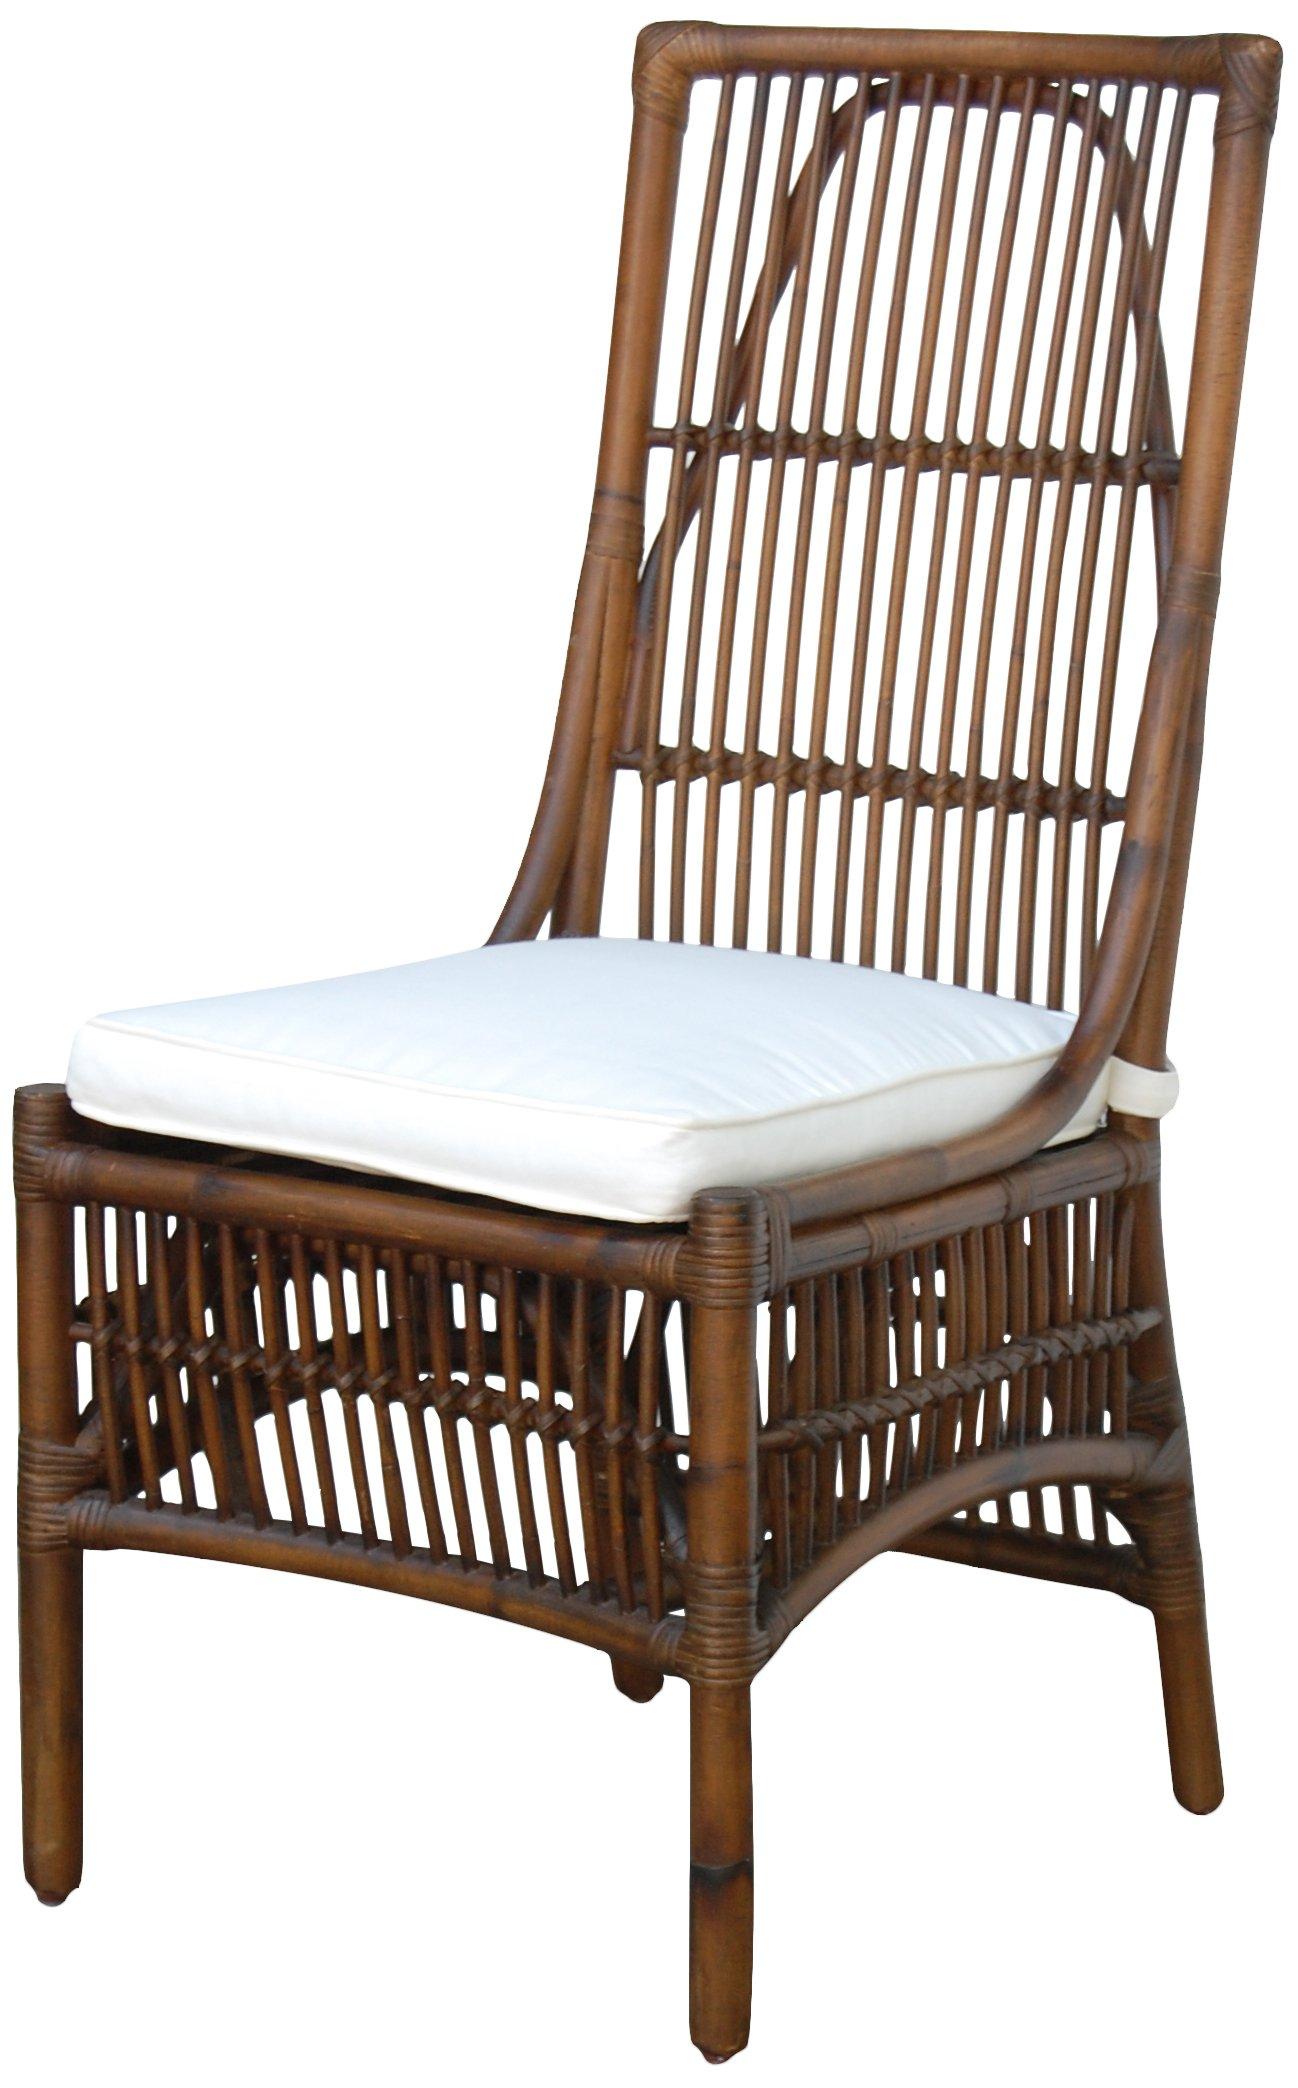 Panama Jack Sunrooms PJS-2001-ATQ-SC Bora Bora Side Chair with Cushion, Sunbrella Canvas Spa